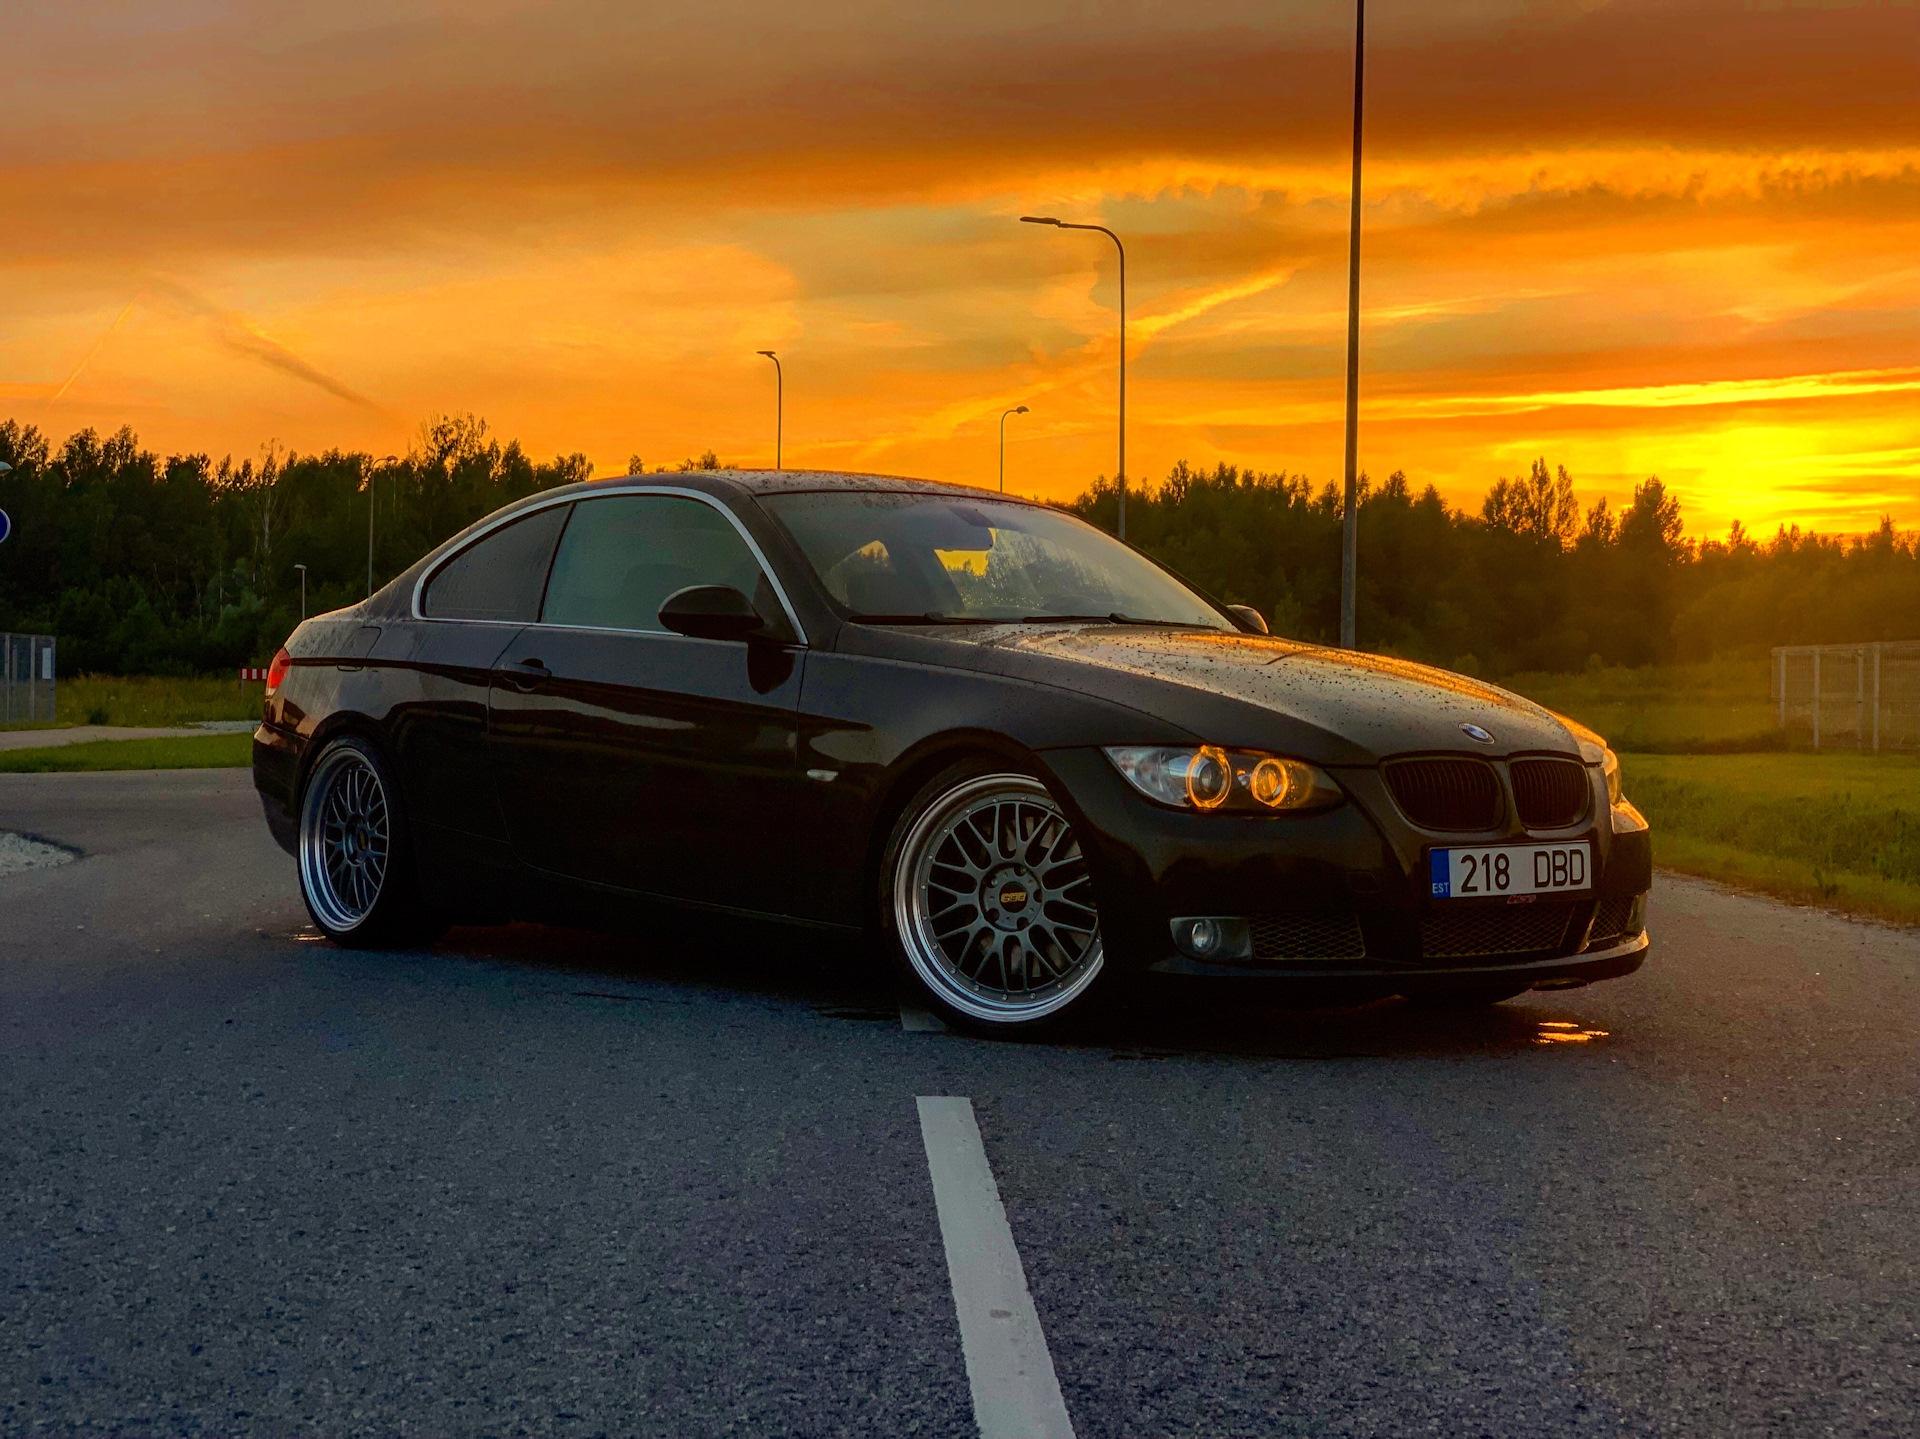 2aaf, 29e1 — тнвд? — BMW 3 series Coupe, 3 0 л , 2006 года на DRIVE2